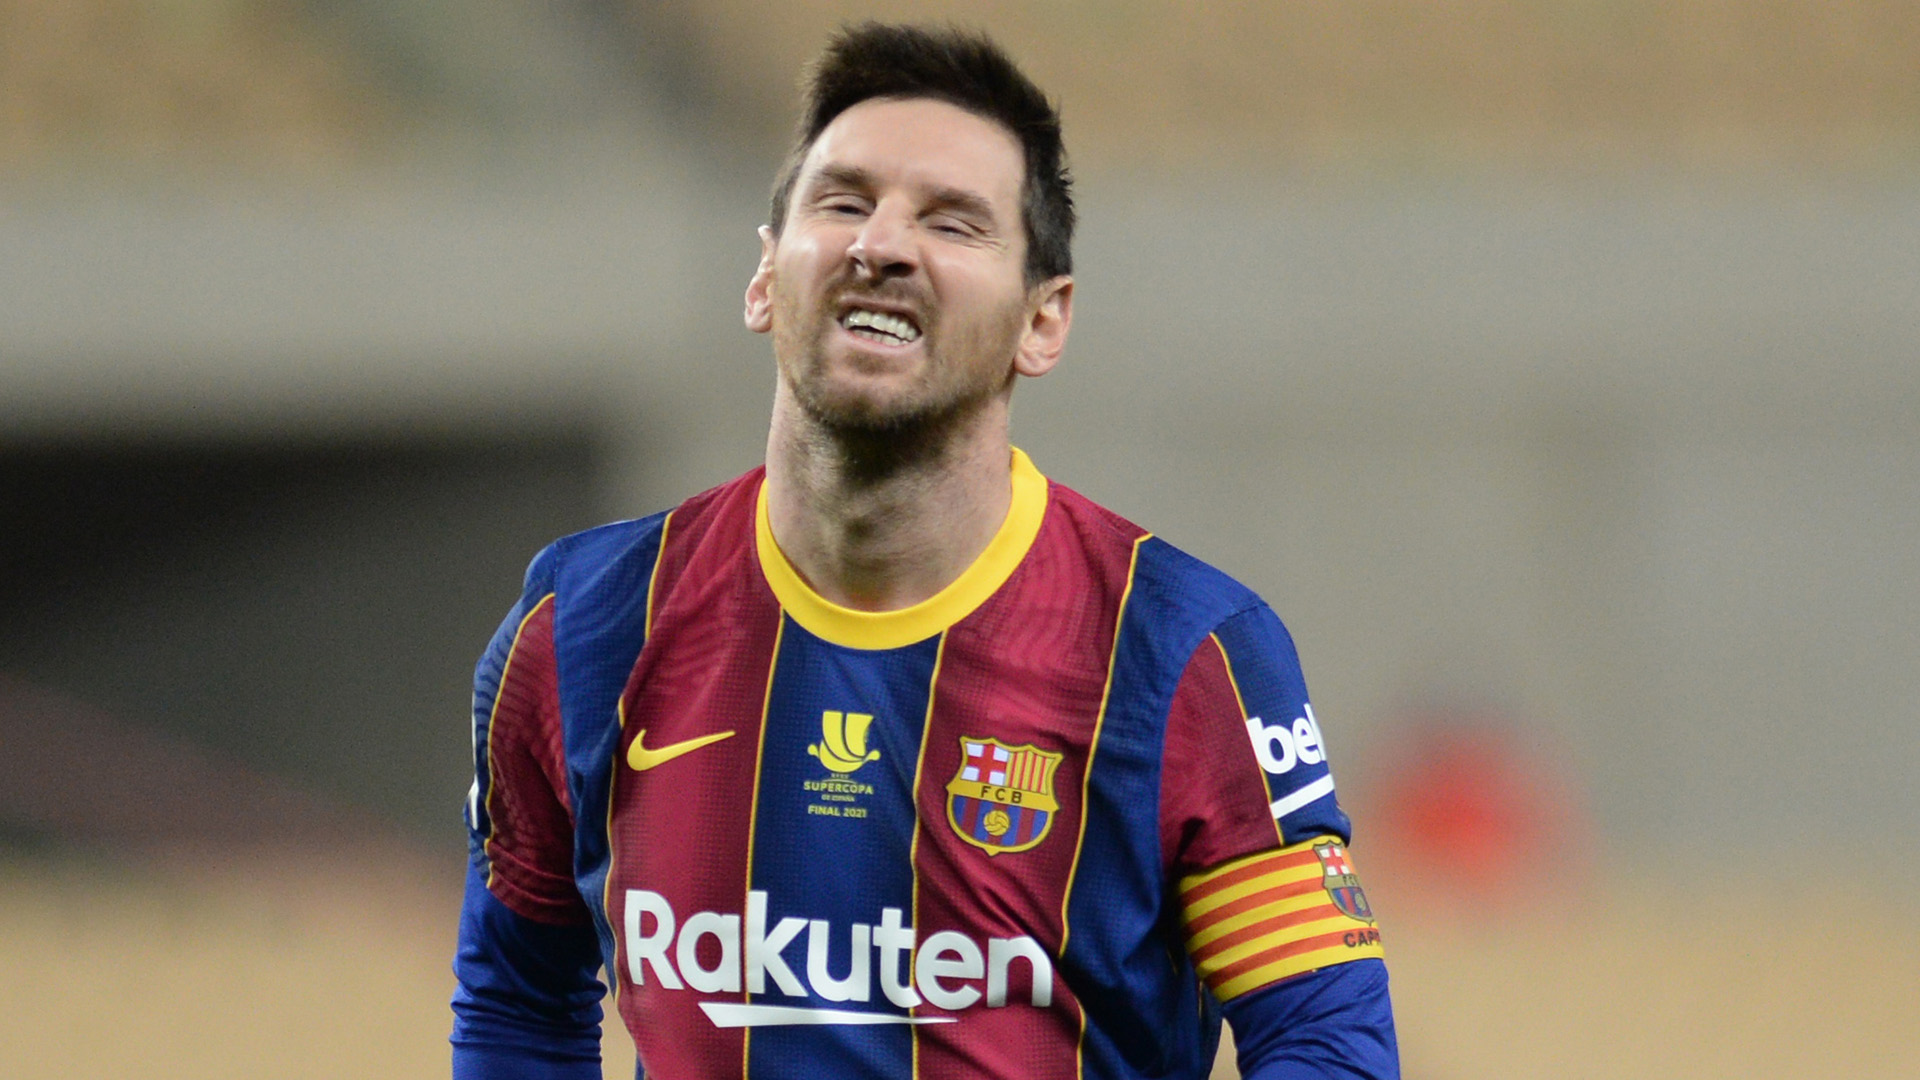 Bartomeu denies leaking Messi's contract